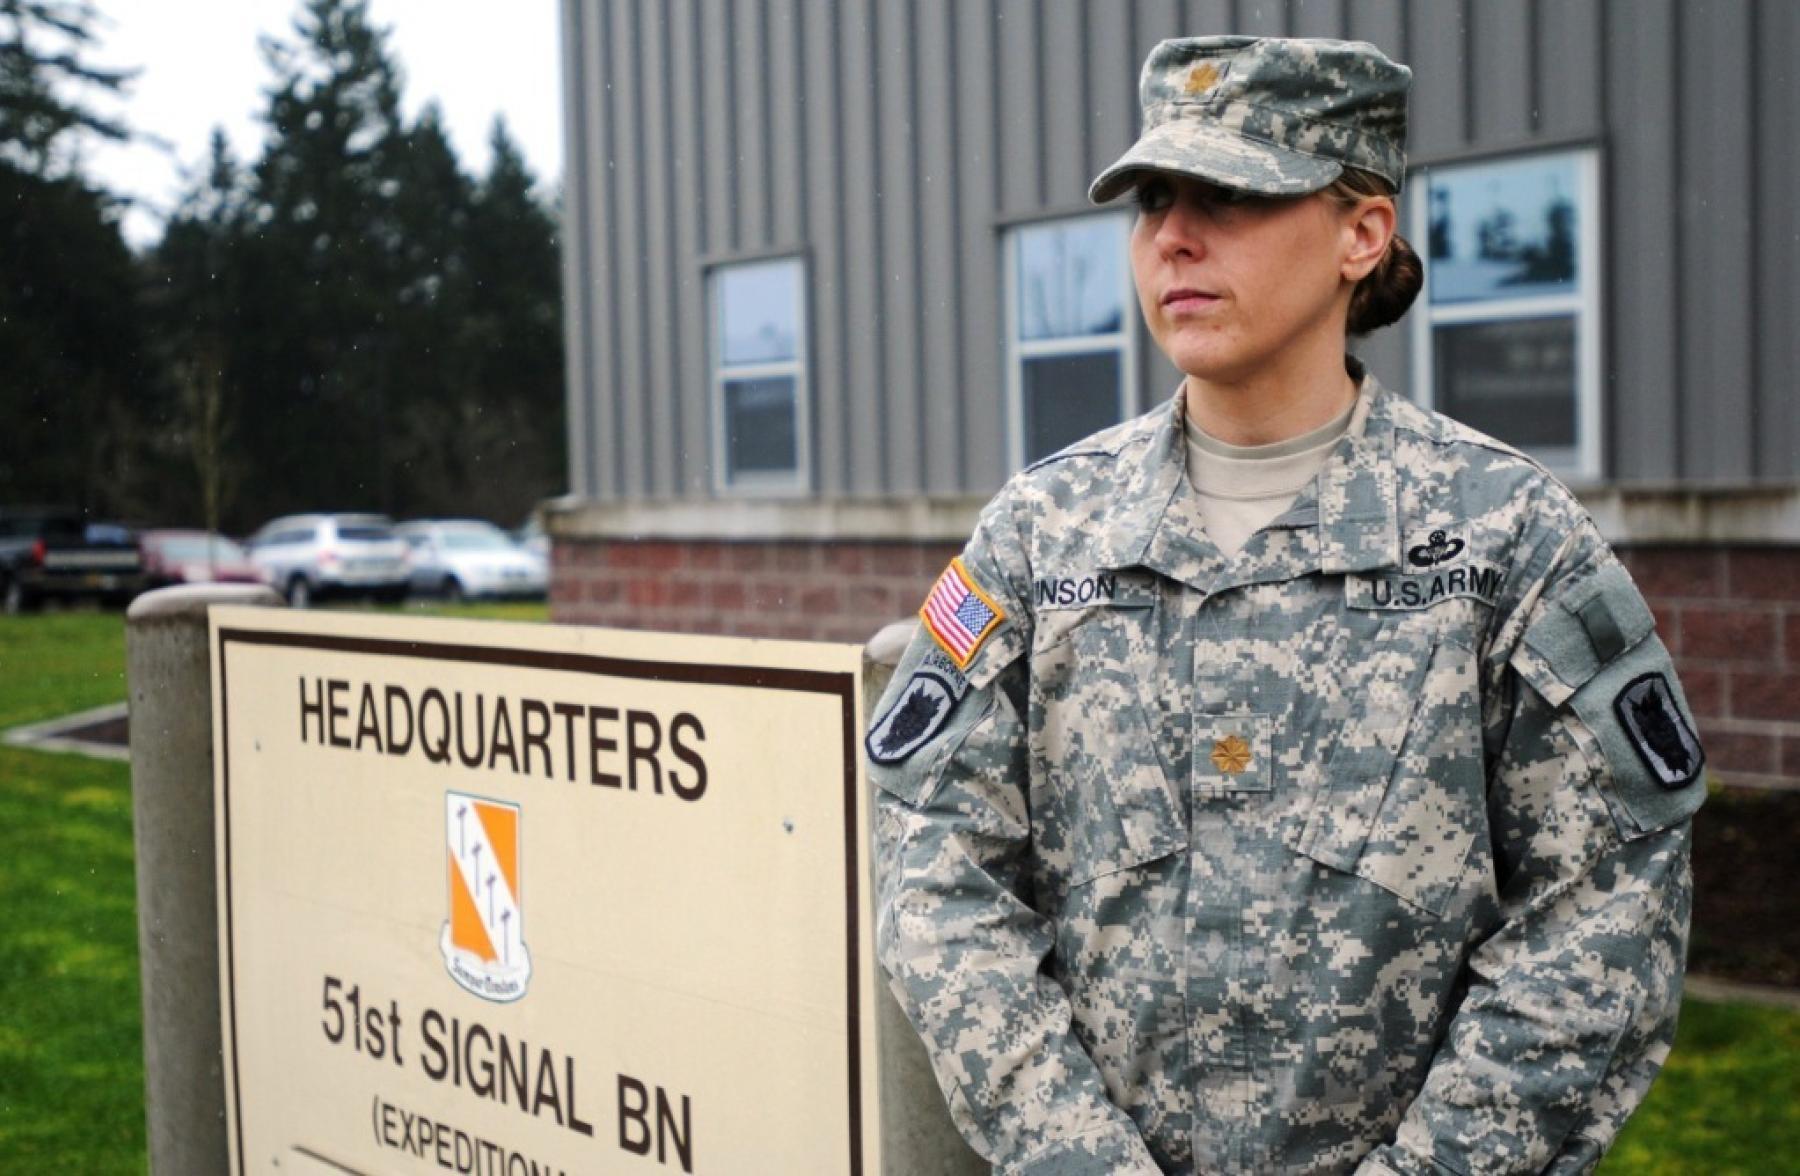 A female officer boarded her flight